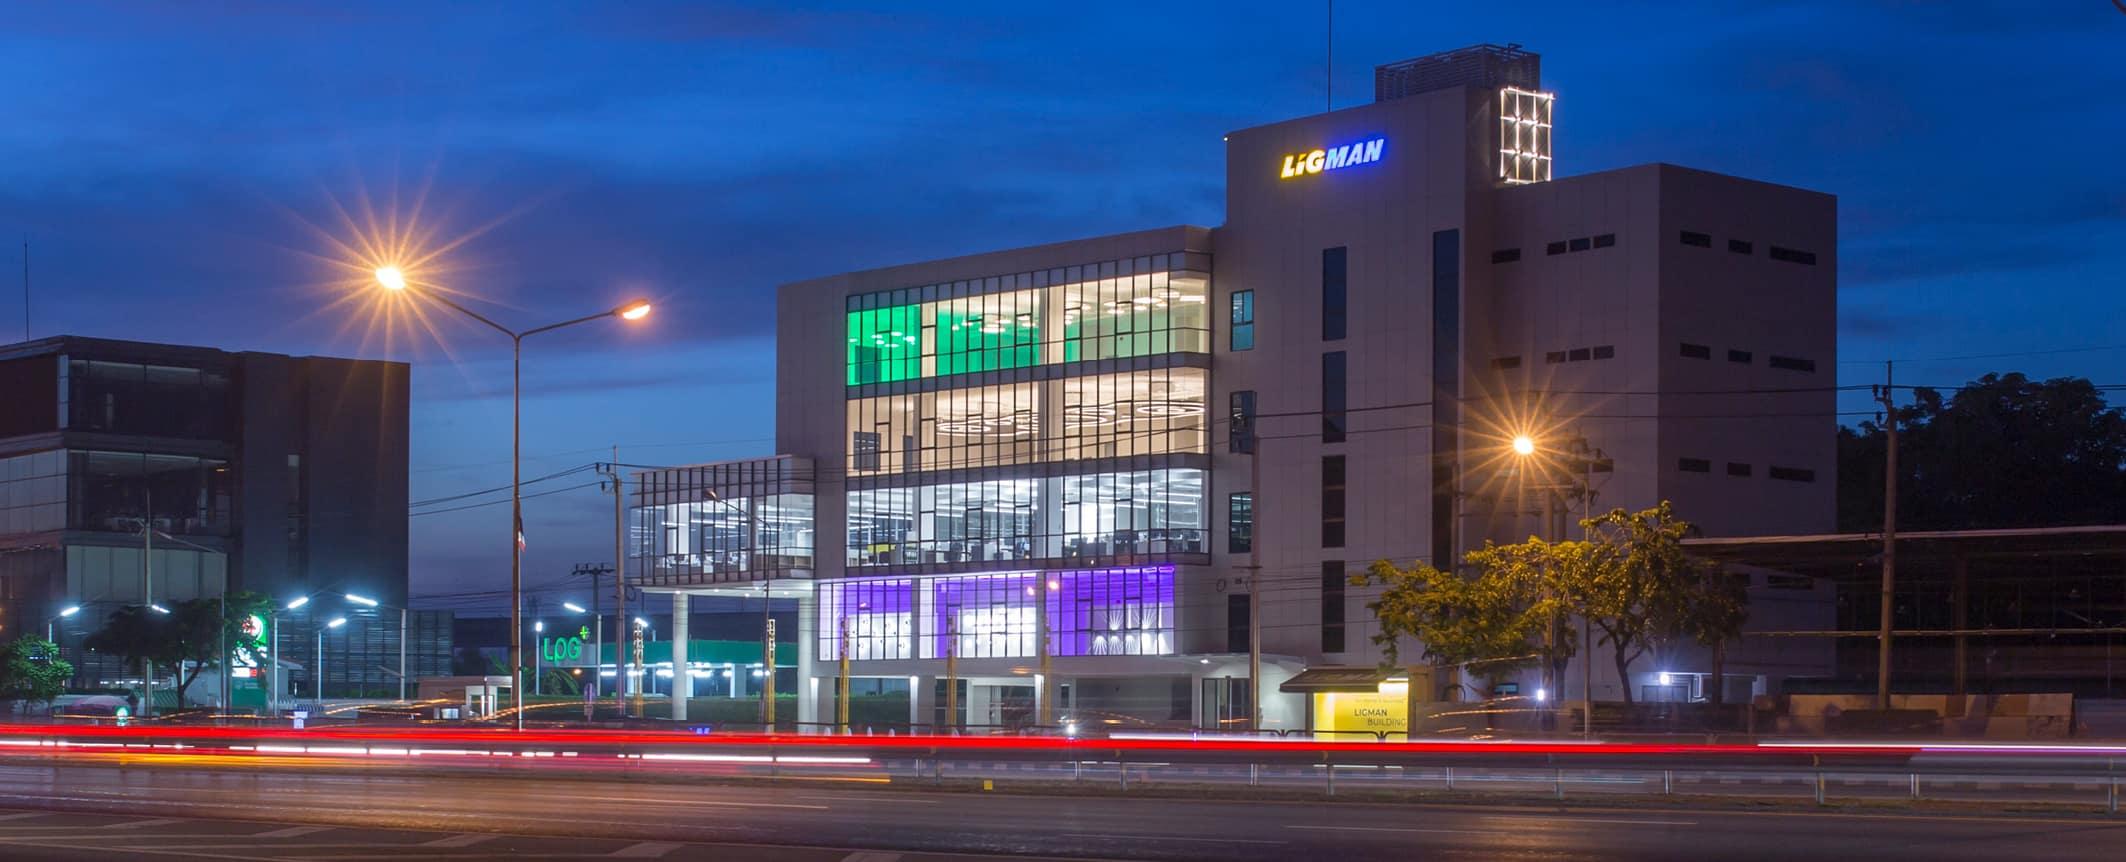 LIGMAN (Experience Center)